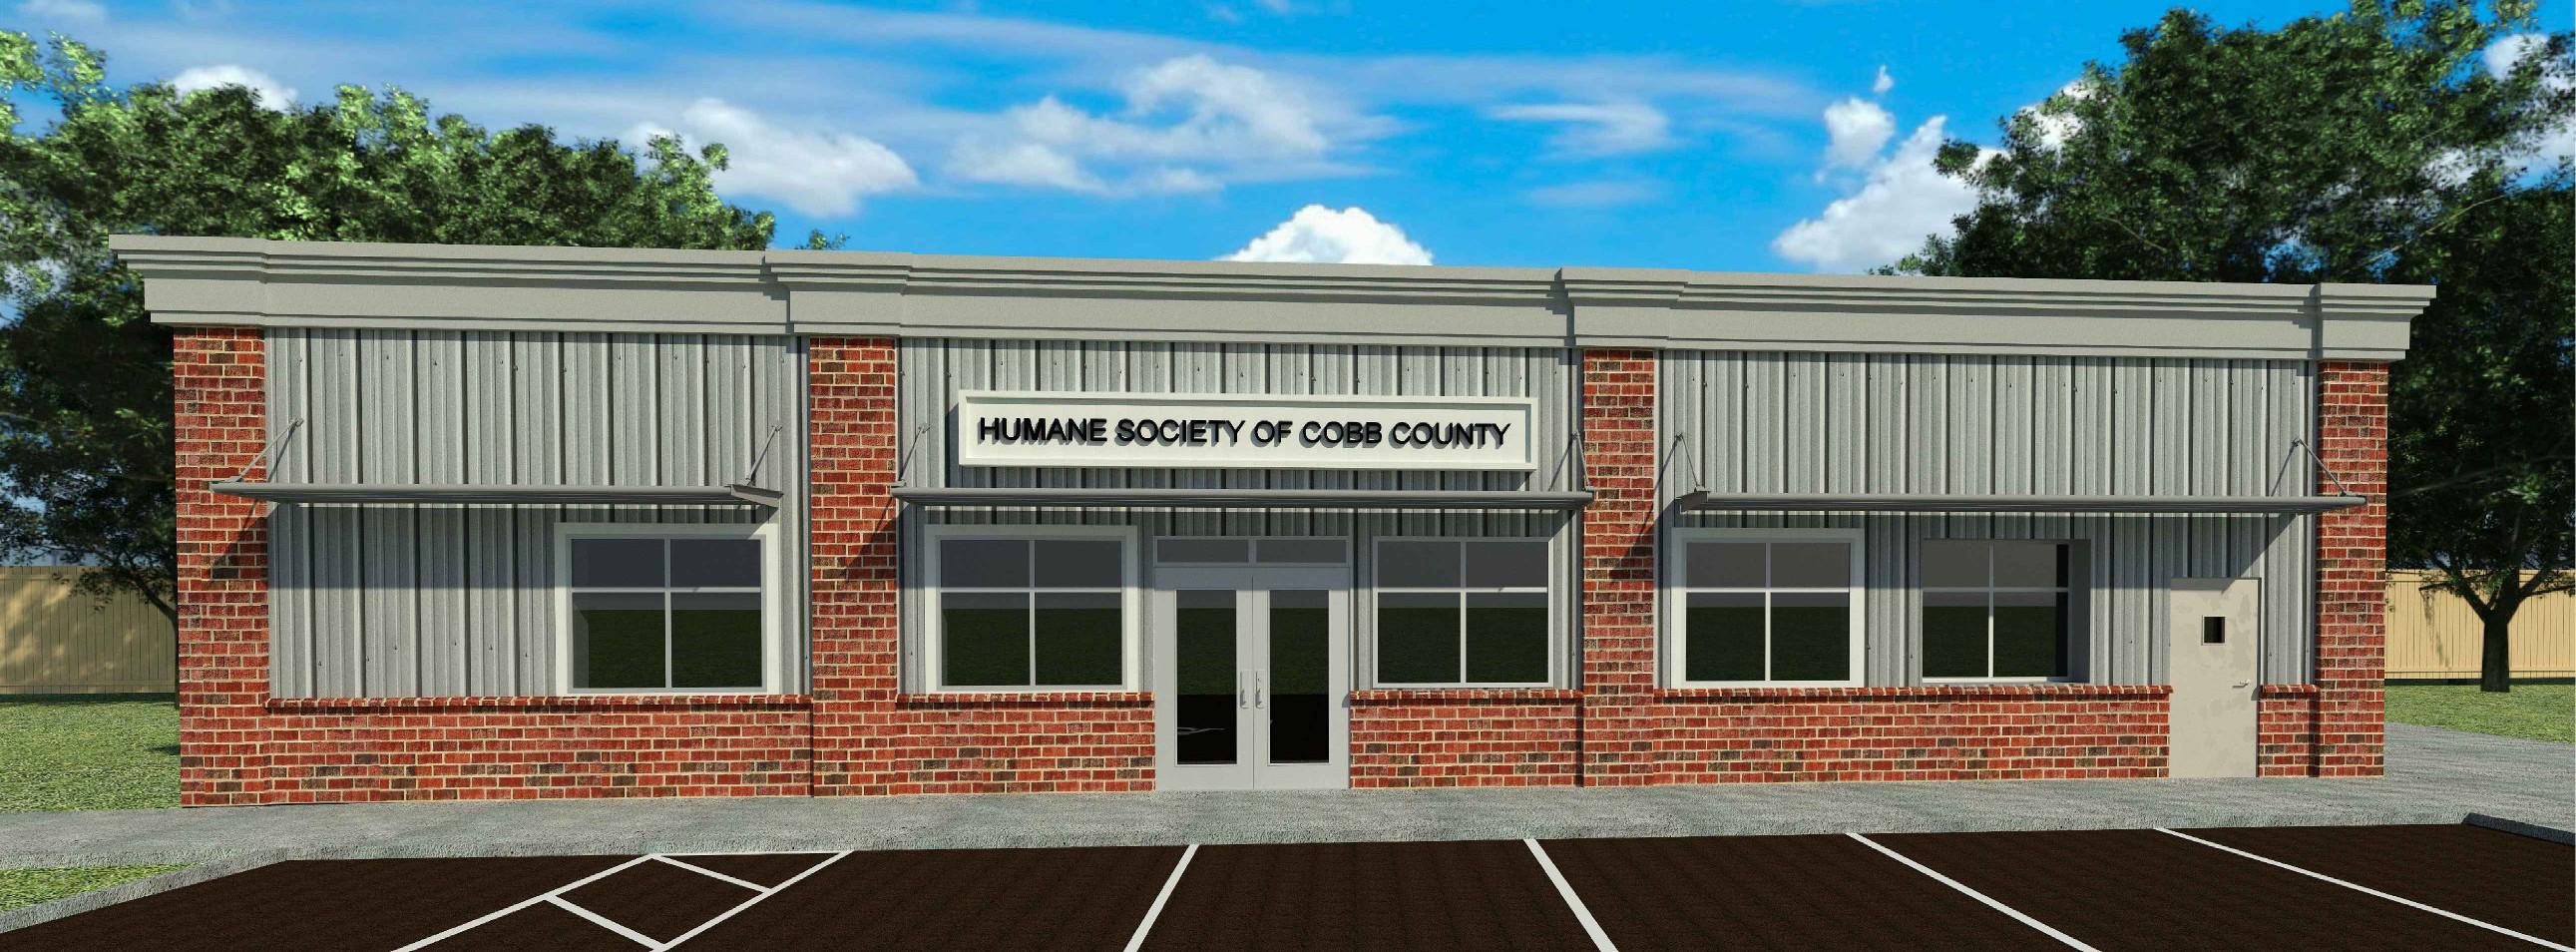 Humane Society of Cobb County – Humane Society of Cobb County